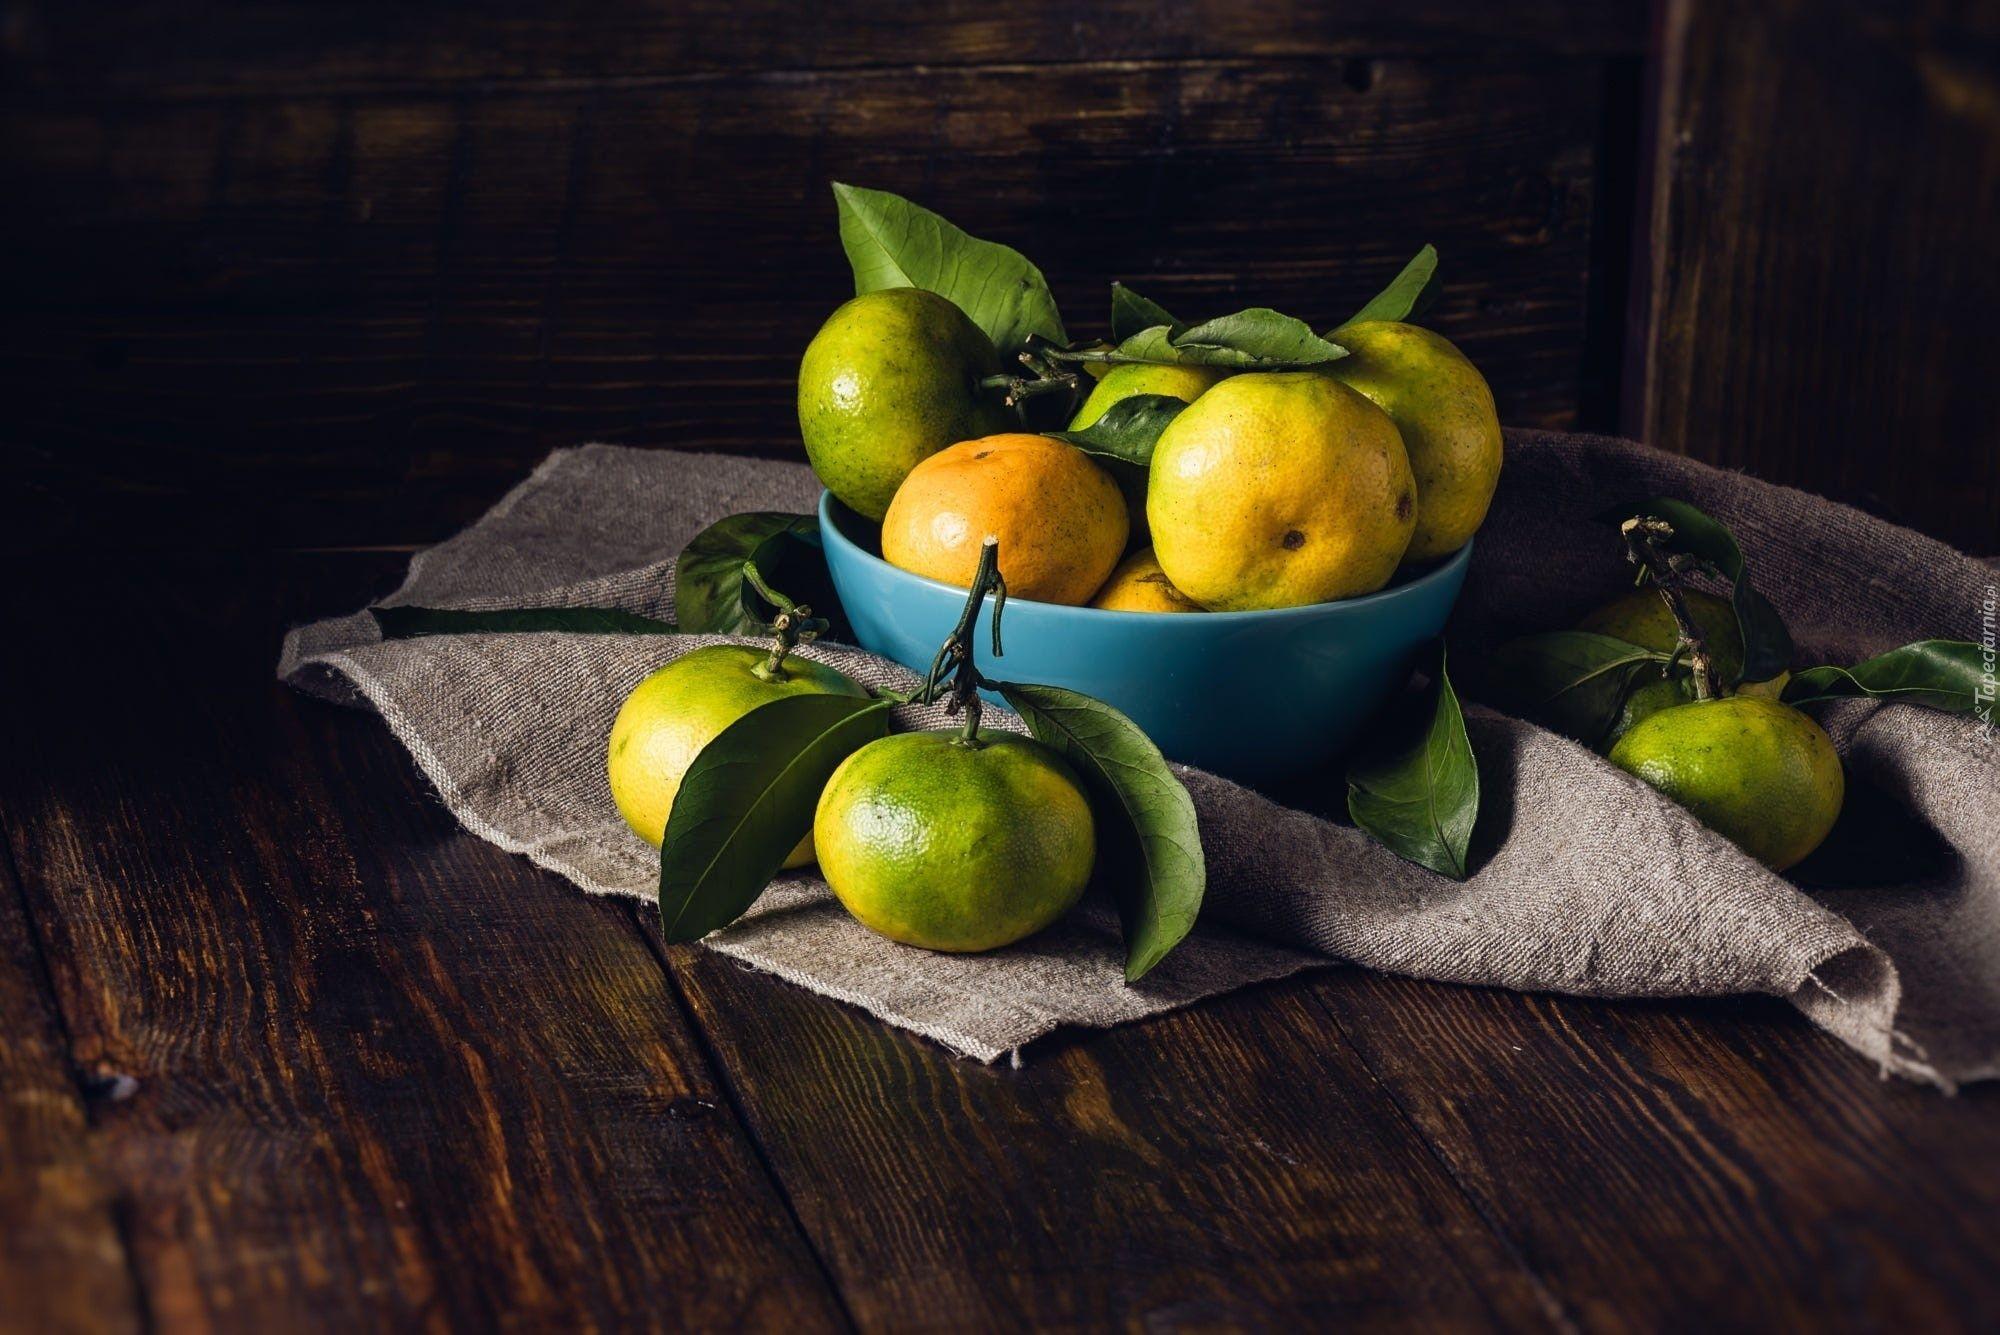 Mandarynki Miska Liscie Serwetka Green Tangerine Still Life Drawing Blue Bowl